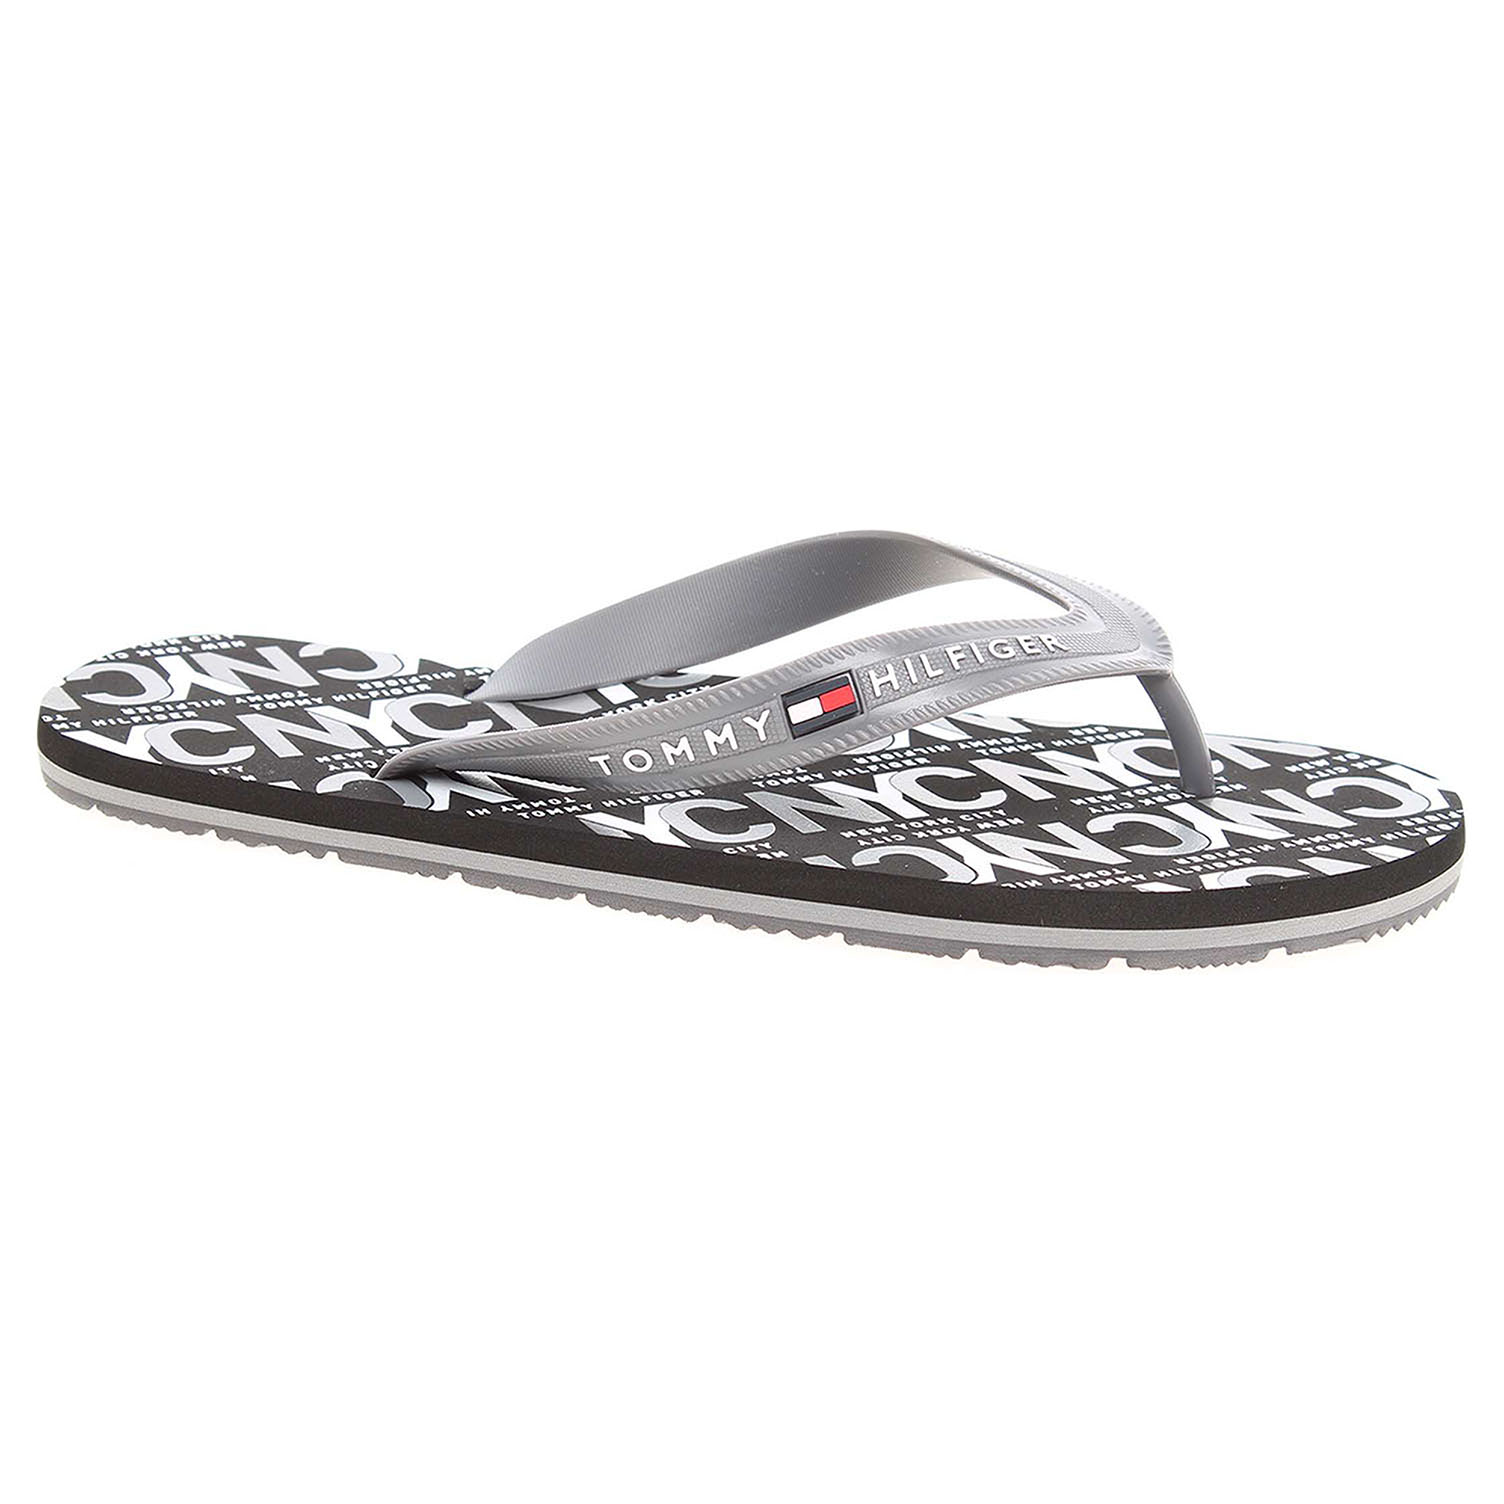 Ecco Pánské plážové pantofle Tommy Hilfiger FM0FM01361 steel grey 24500169